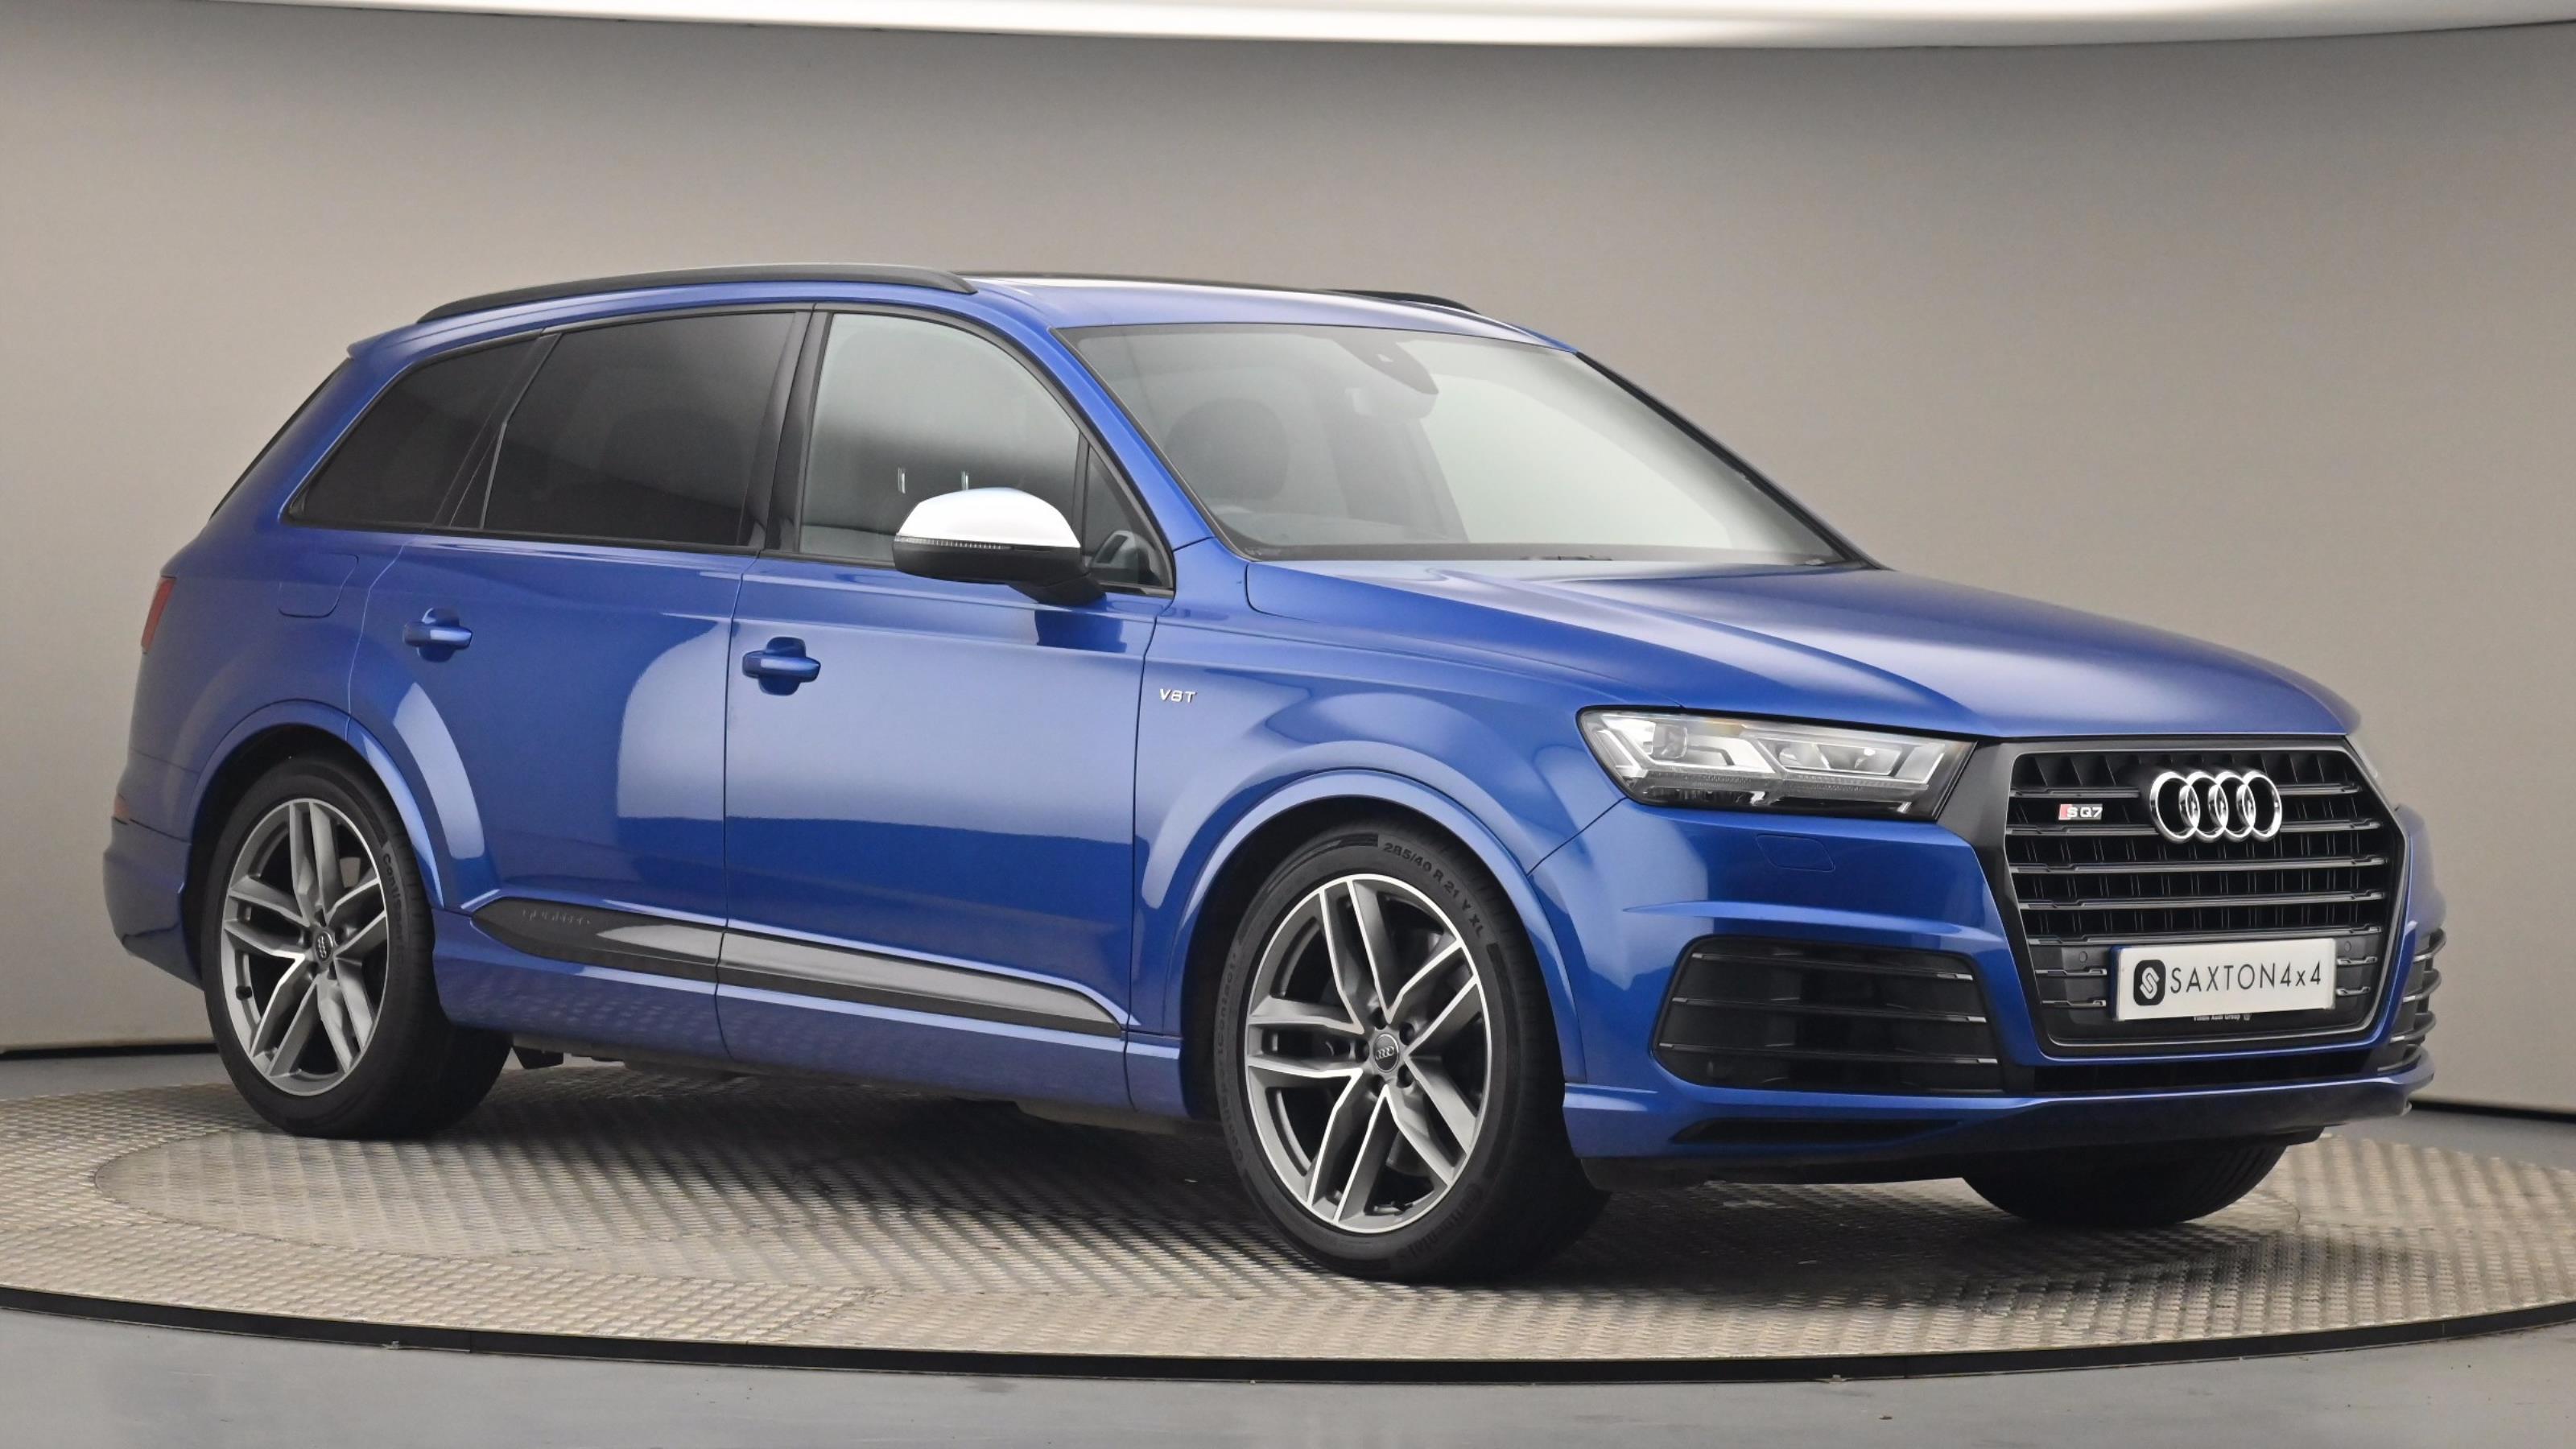 Used 2017 Audi Q7 SQ7 Quattro 5dr Tip Auto BLUE at Saxton4x4